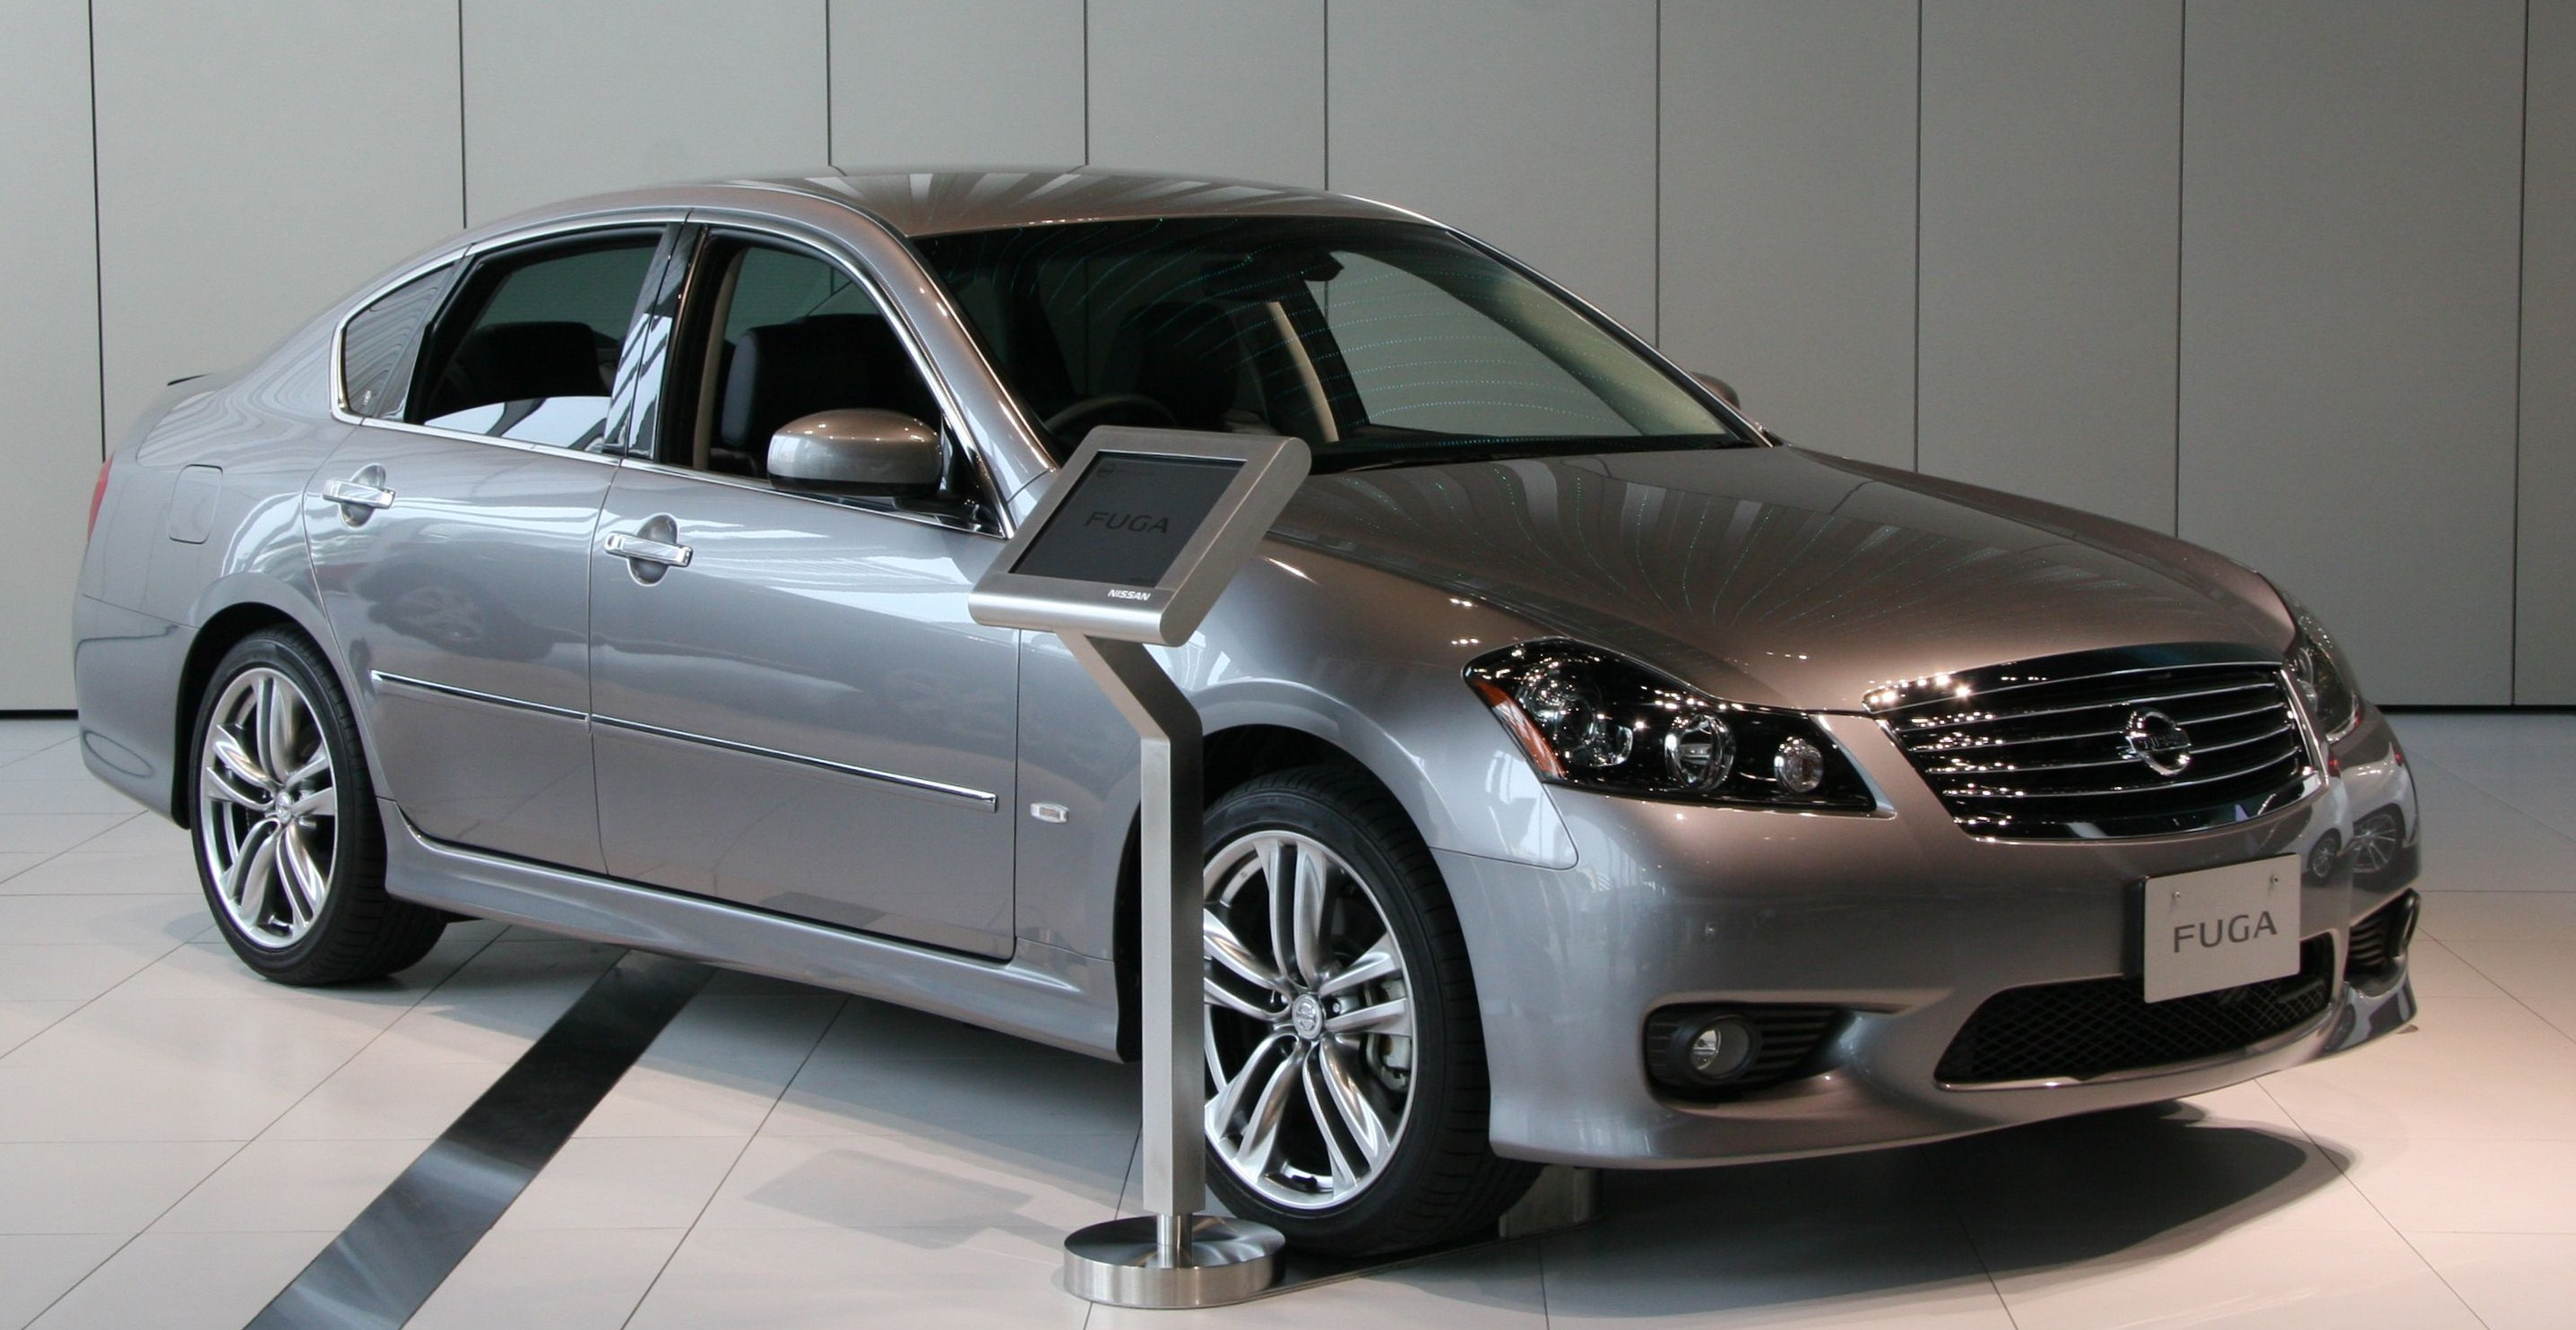 File Nissan Fuga 350gt Type S Jpg Wikimedia Commons